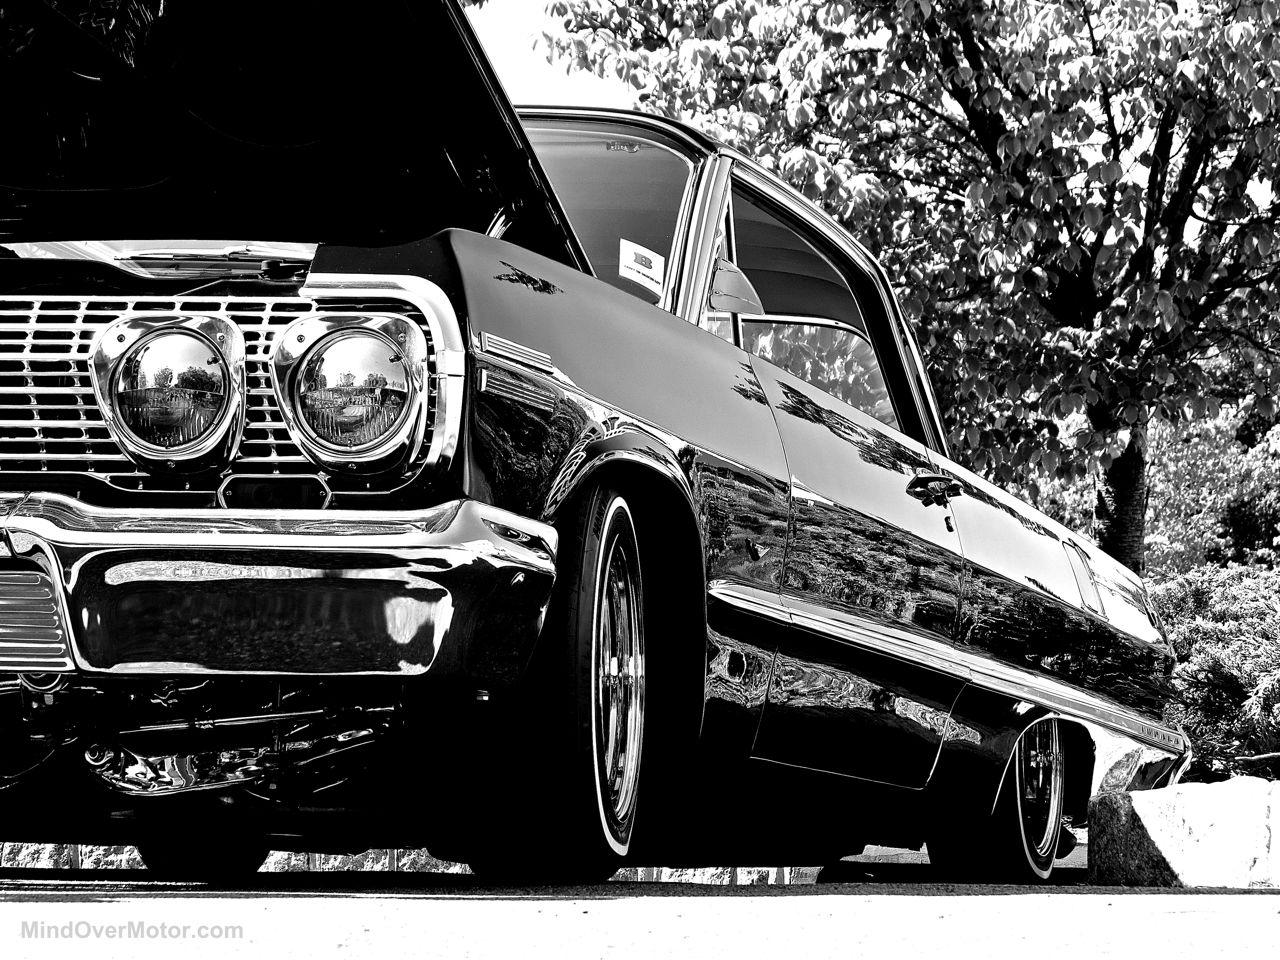 Chevrolet Impala Low Rider Lead East 3